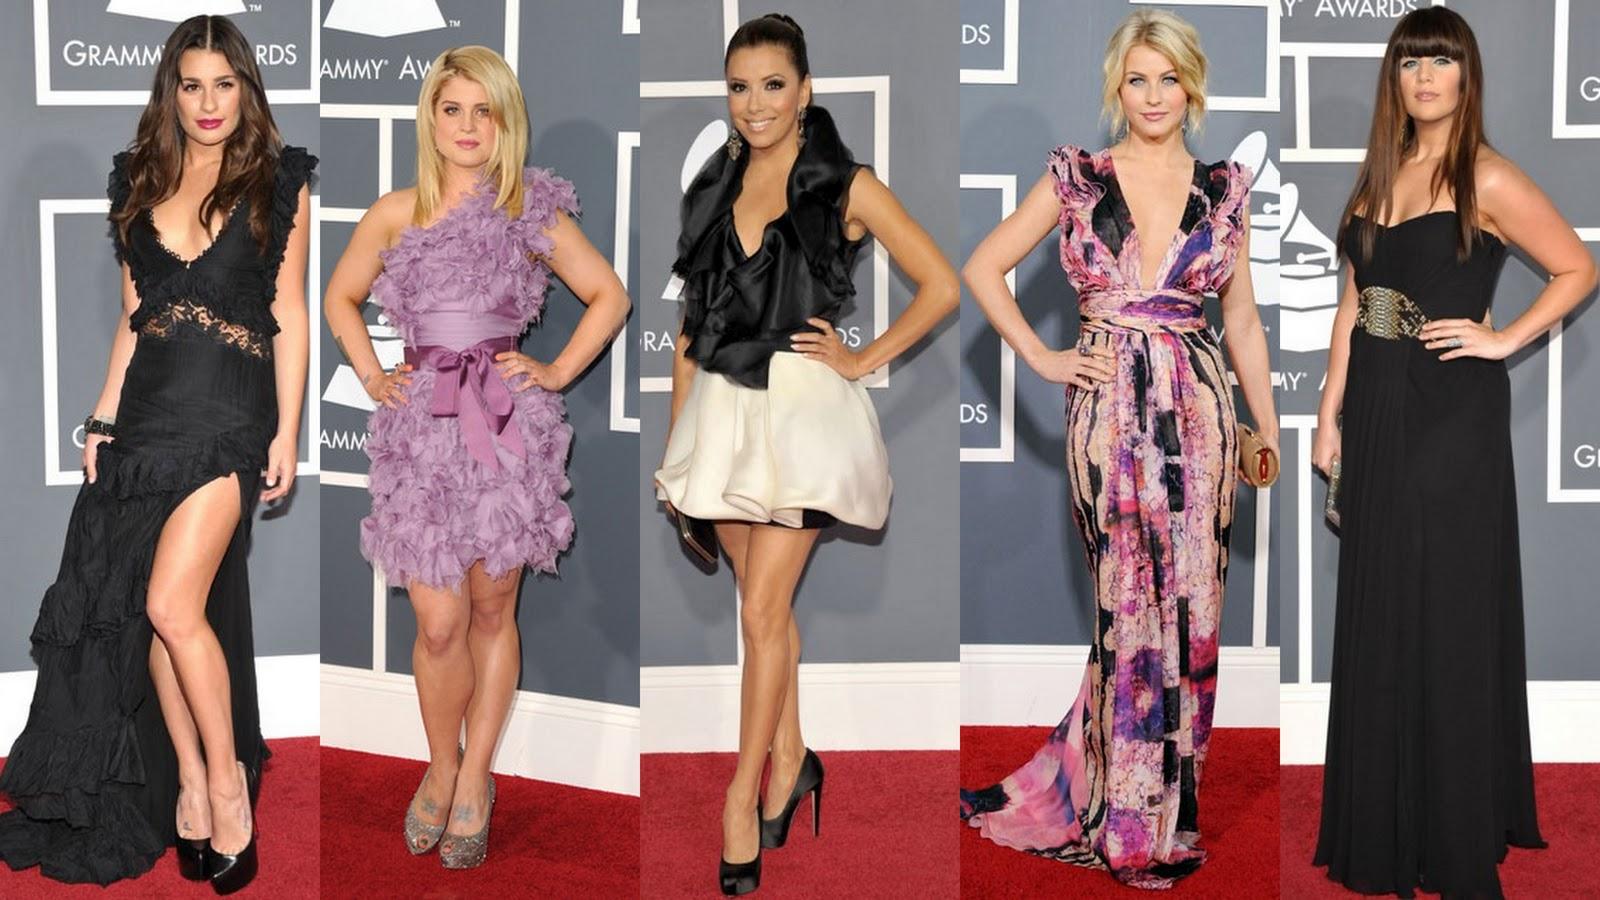 http://3.bp.blogspot.com/-Ma6cM3T4M20/TVkqKQABNMI/AAAAAAAAAPQ/mS2MoHFPK_c/s1600/Grammys+best.jpg